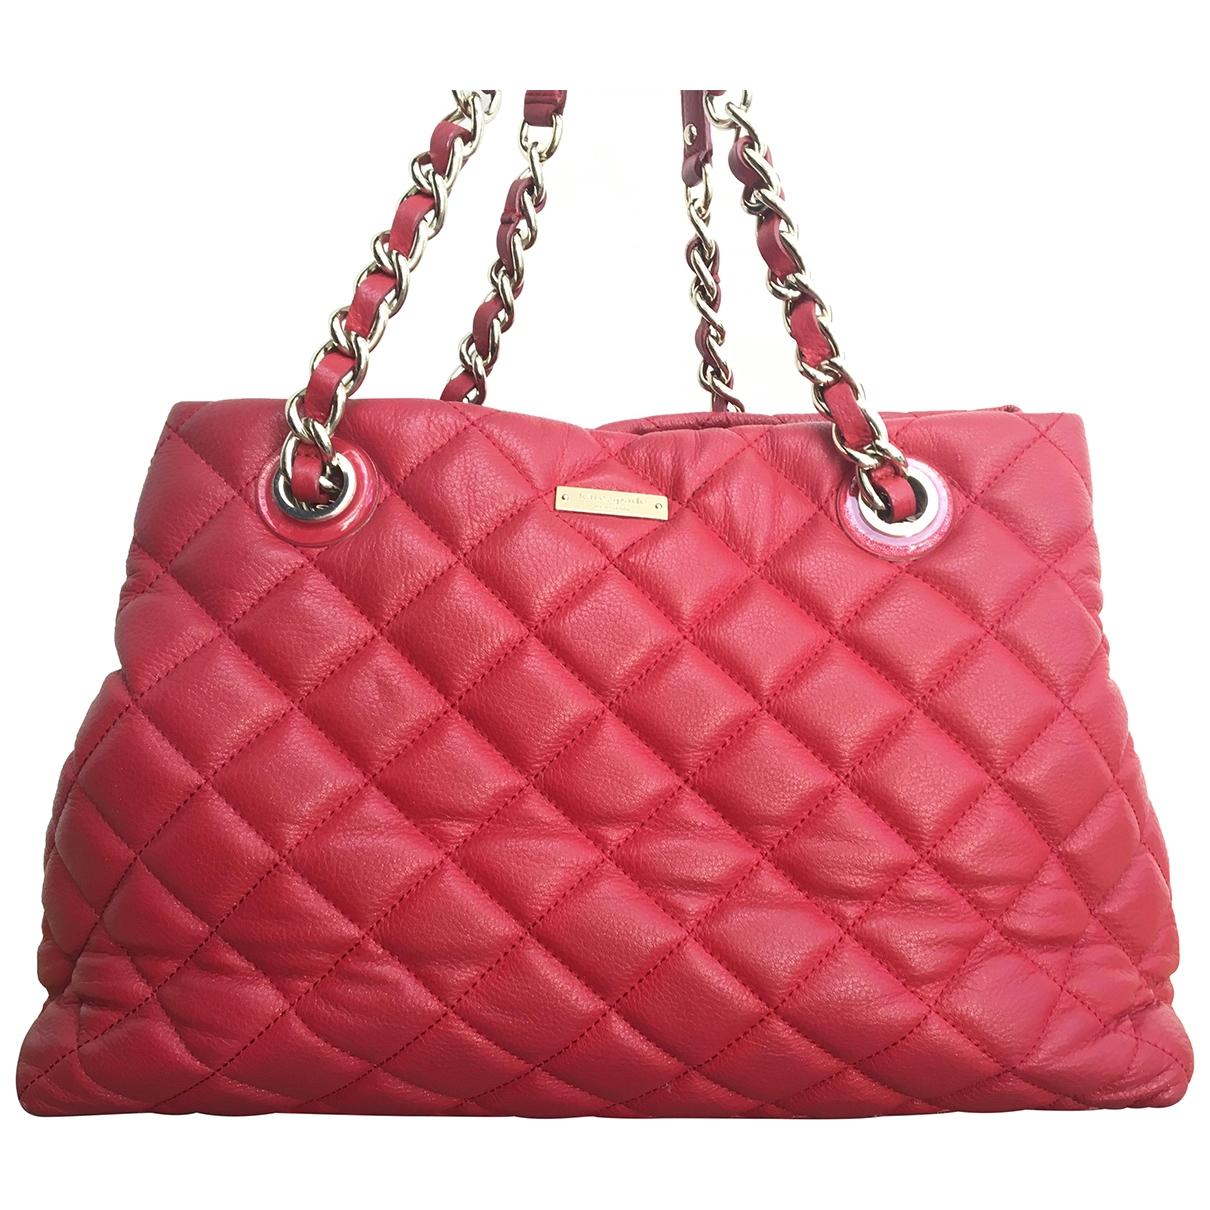 Kate Spade \N Red Leather handbag for Women \N